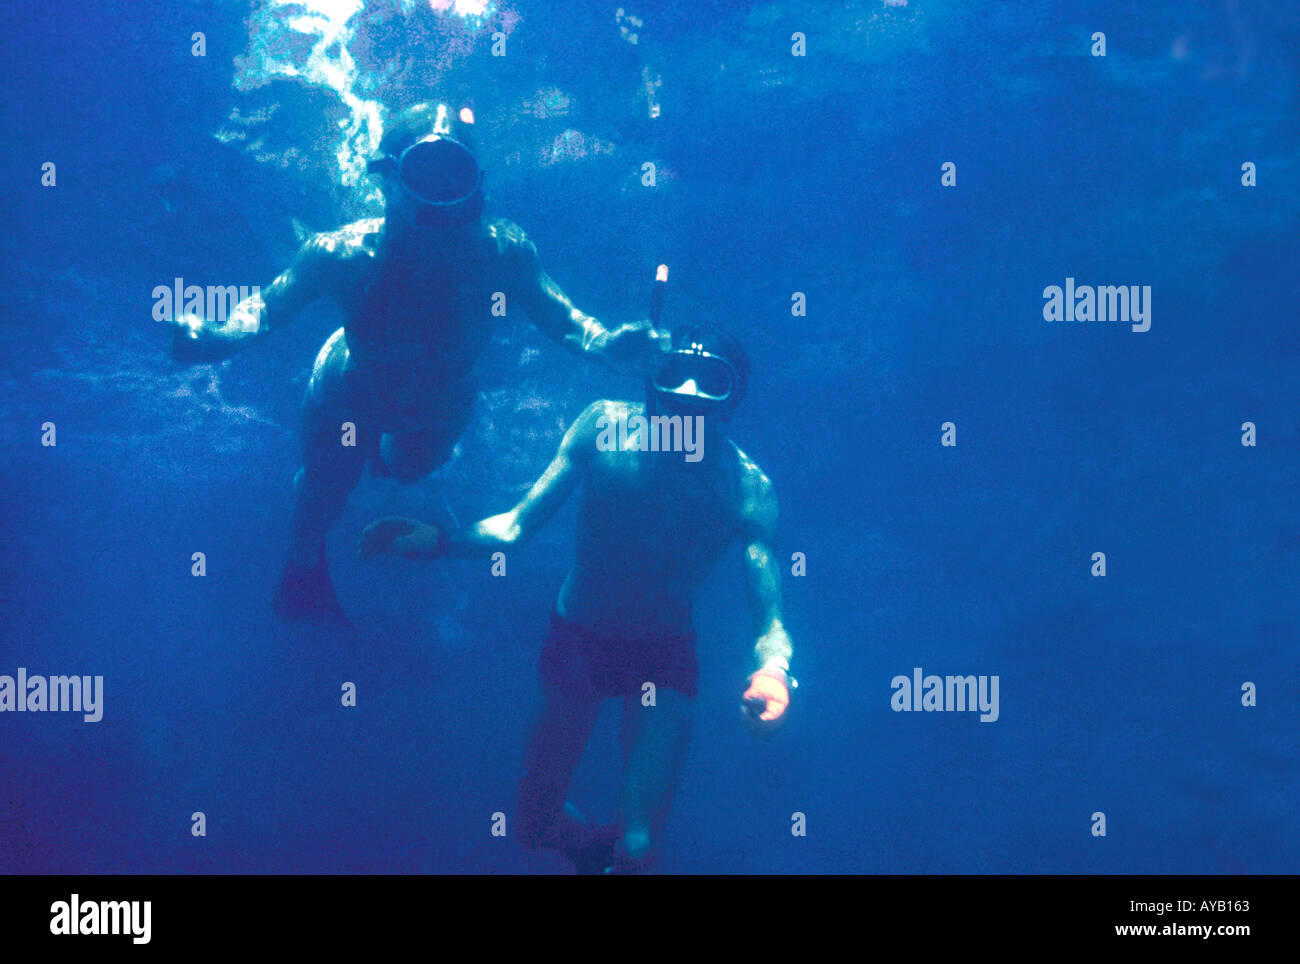 Par bucear bajo el agua Imagen De Stock